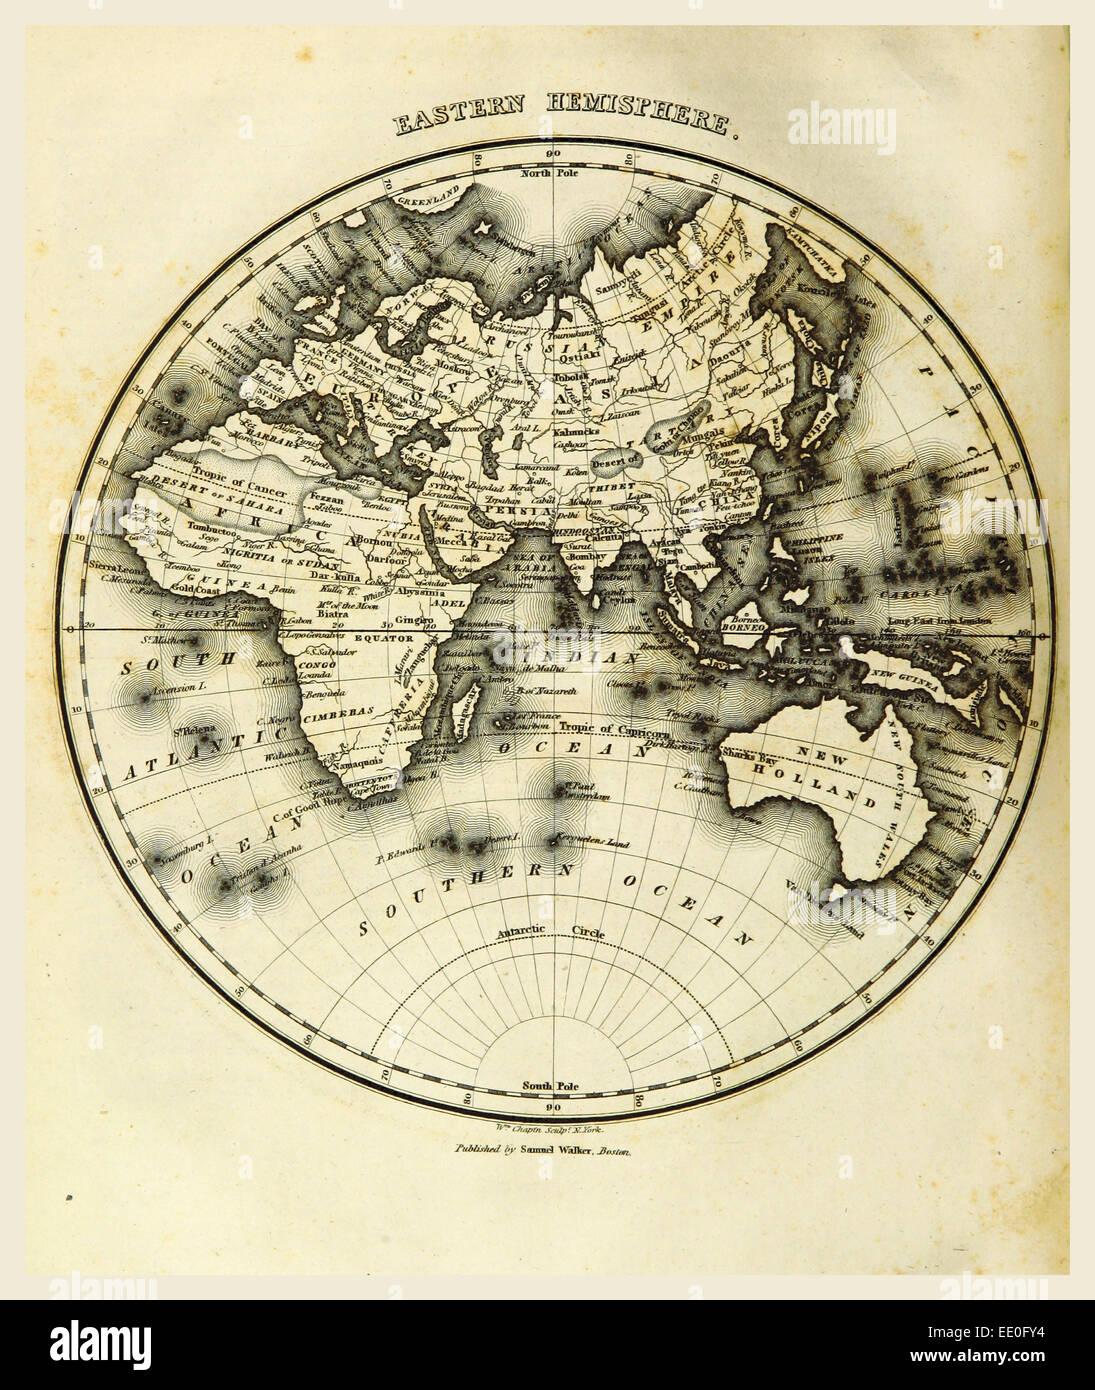 Eastern Hemisphere map, 19th century engraving - Stock Image